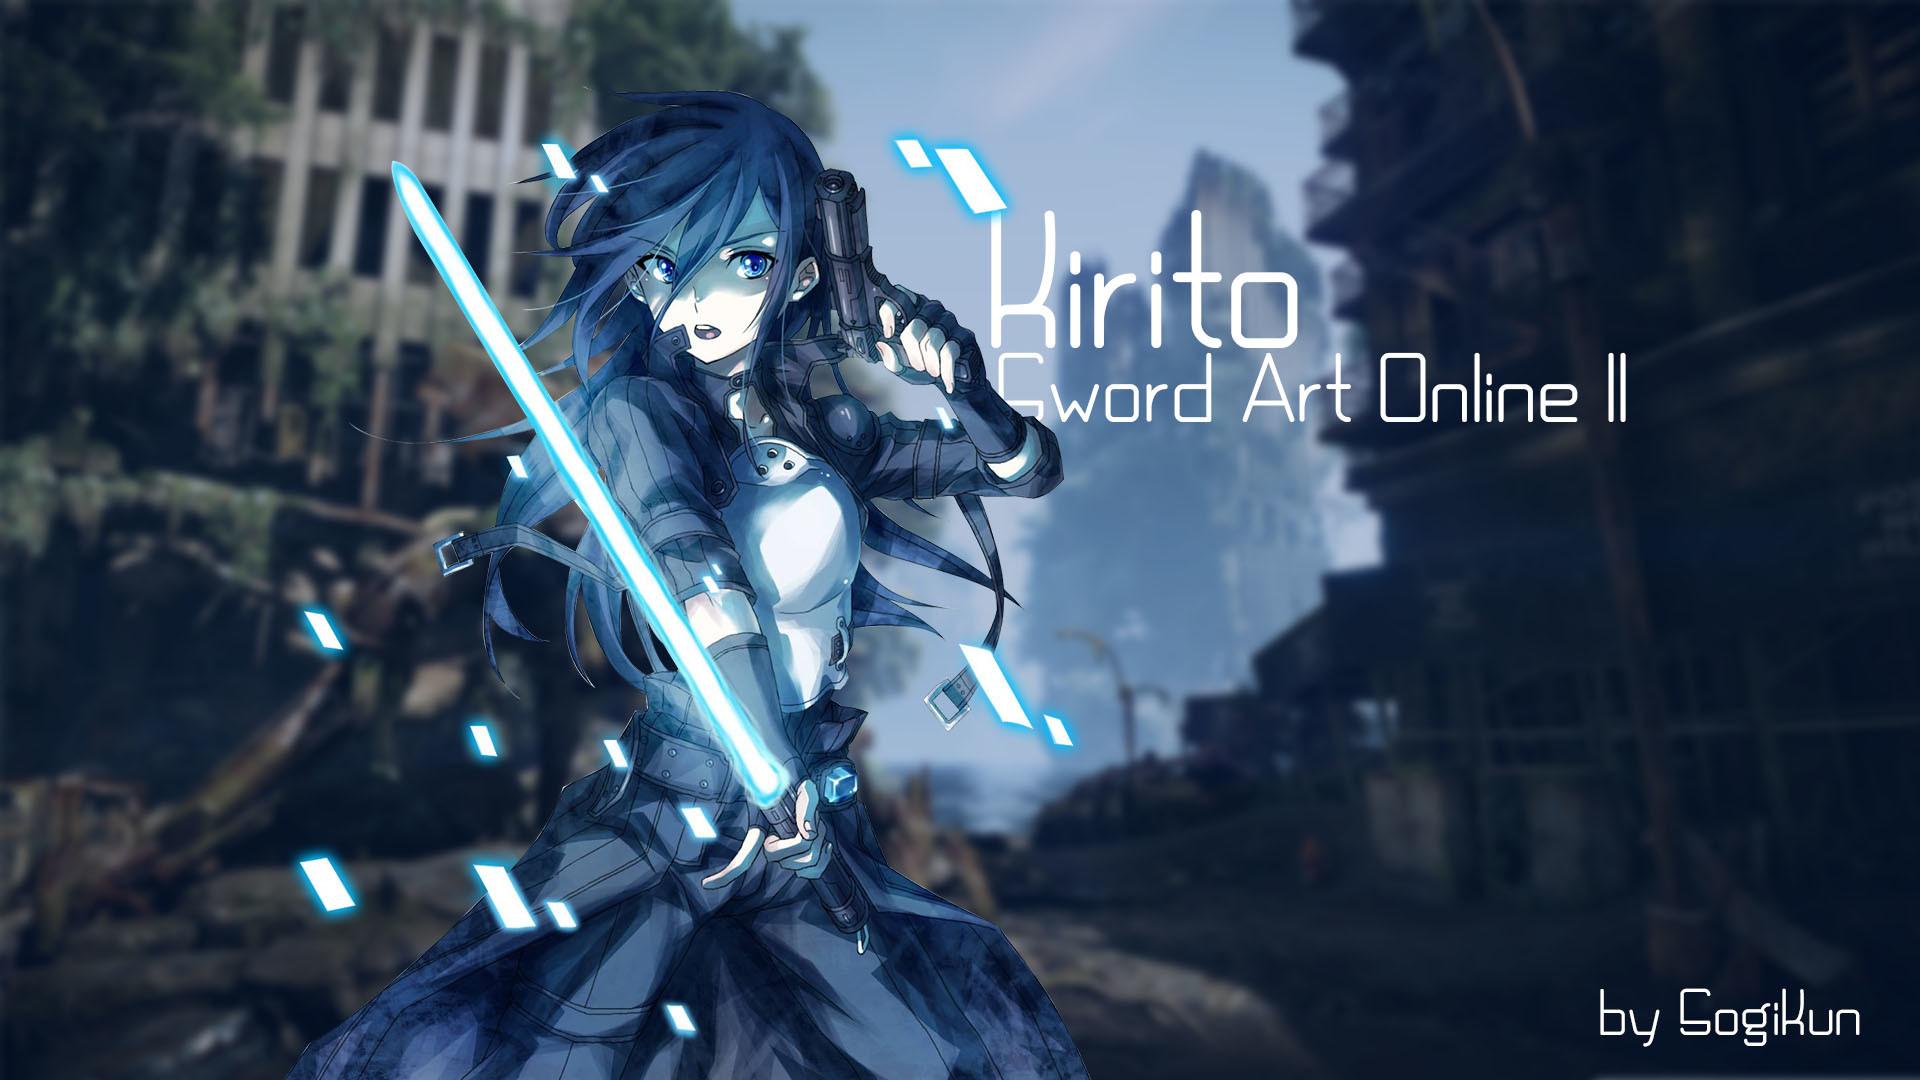 … Sword Art Online II – Kirito Wallpaper by SogiKun